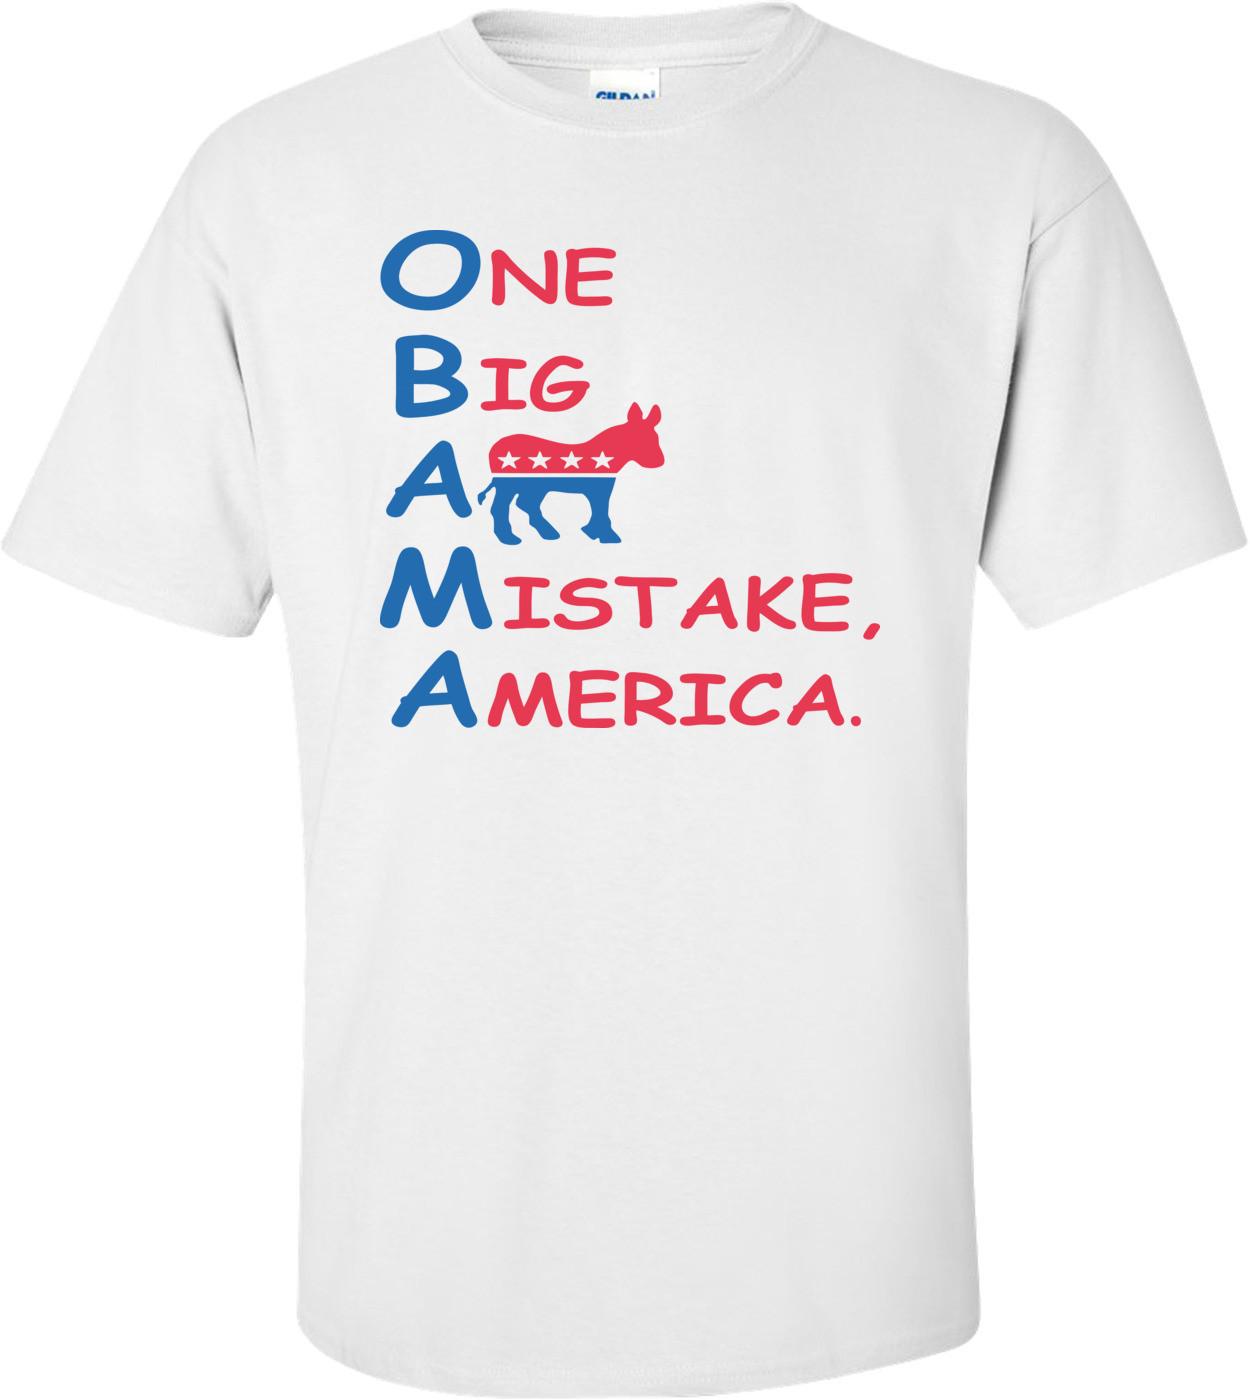 One Big Ass Mistake America Anti Obama T-shirt